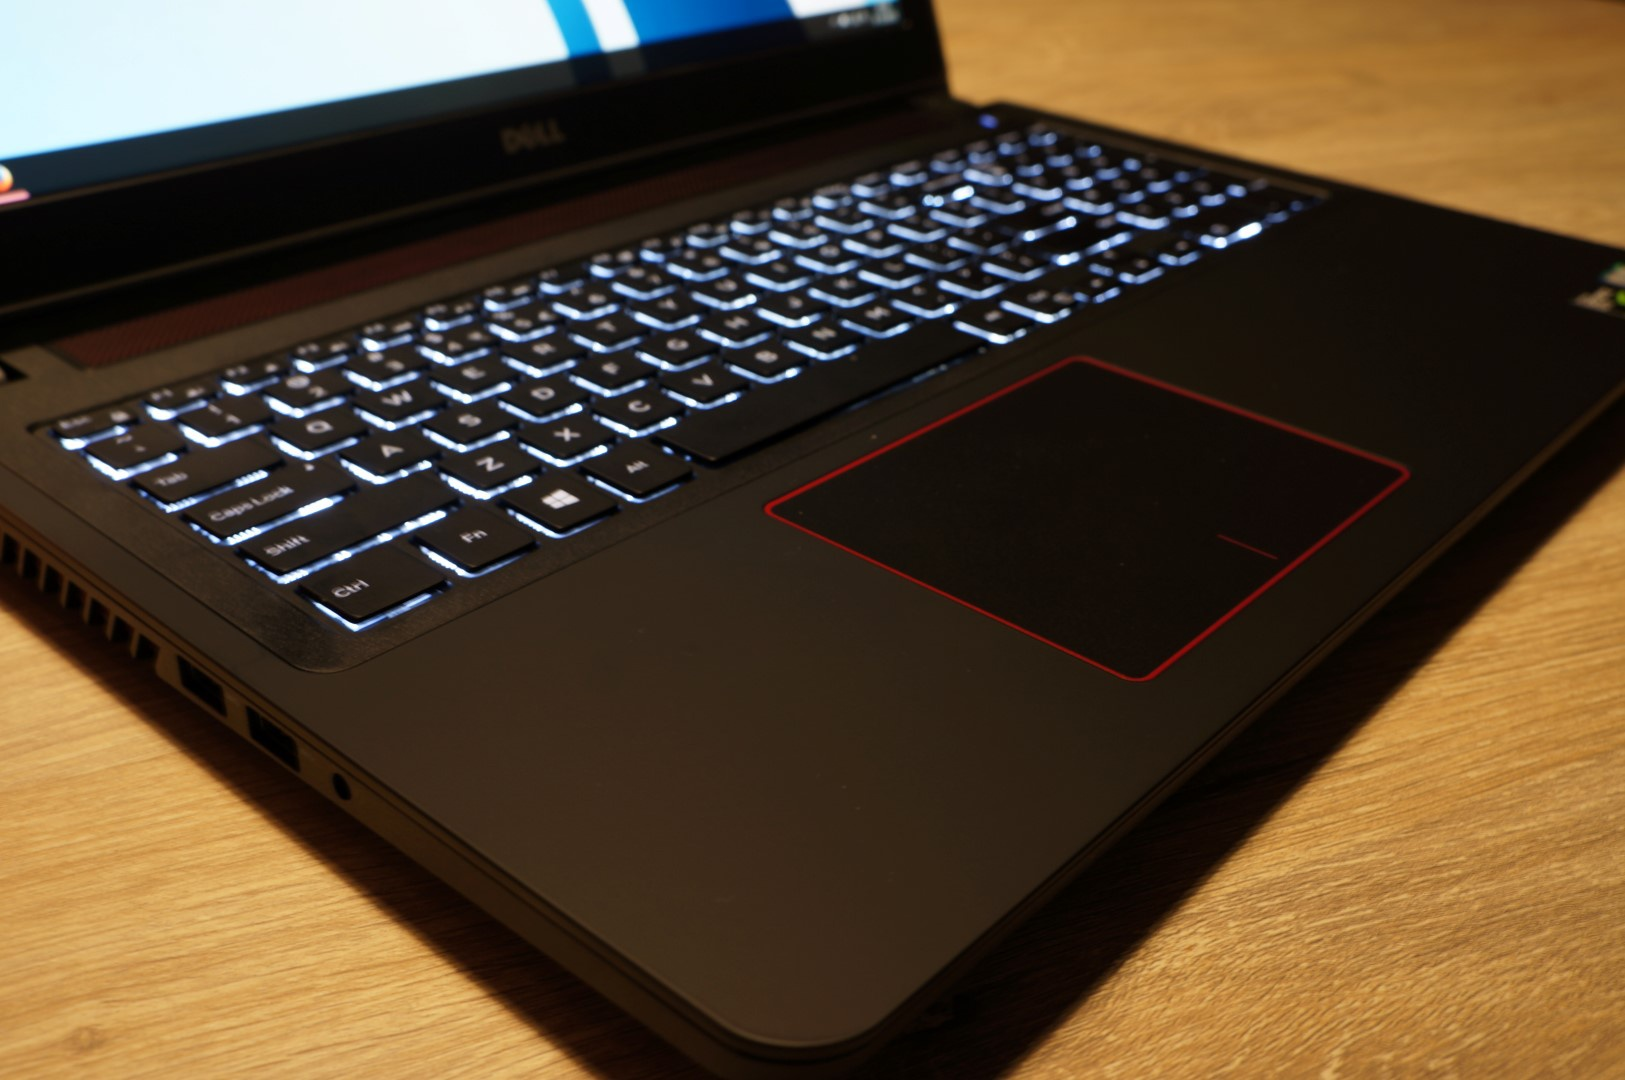 Dell Inspiron 15-7559 (CN95701, Qwerty toetsenbord) - X-Kiwi ...